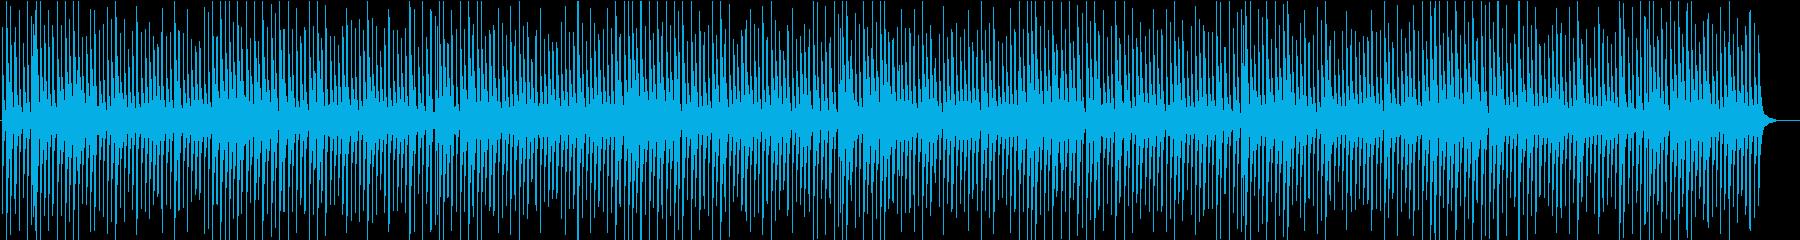 "Okinawa folk song ""Asatoya Yunta"" Sanshin only's reproduced waveform"